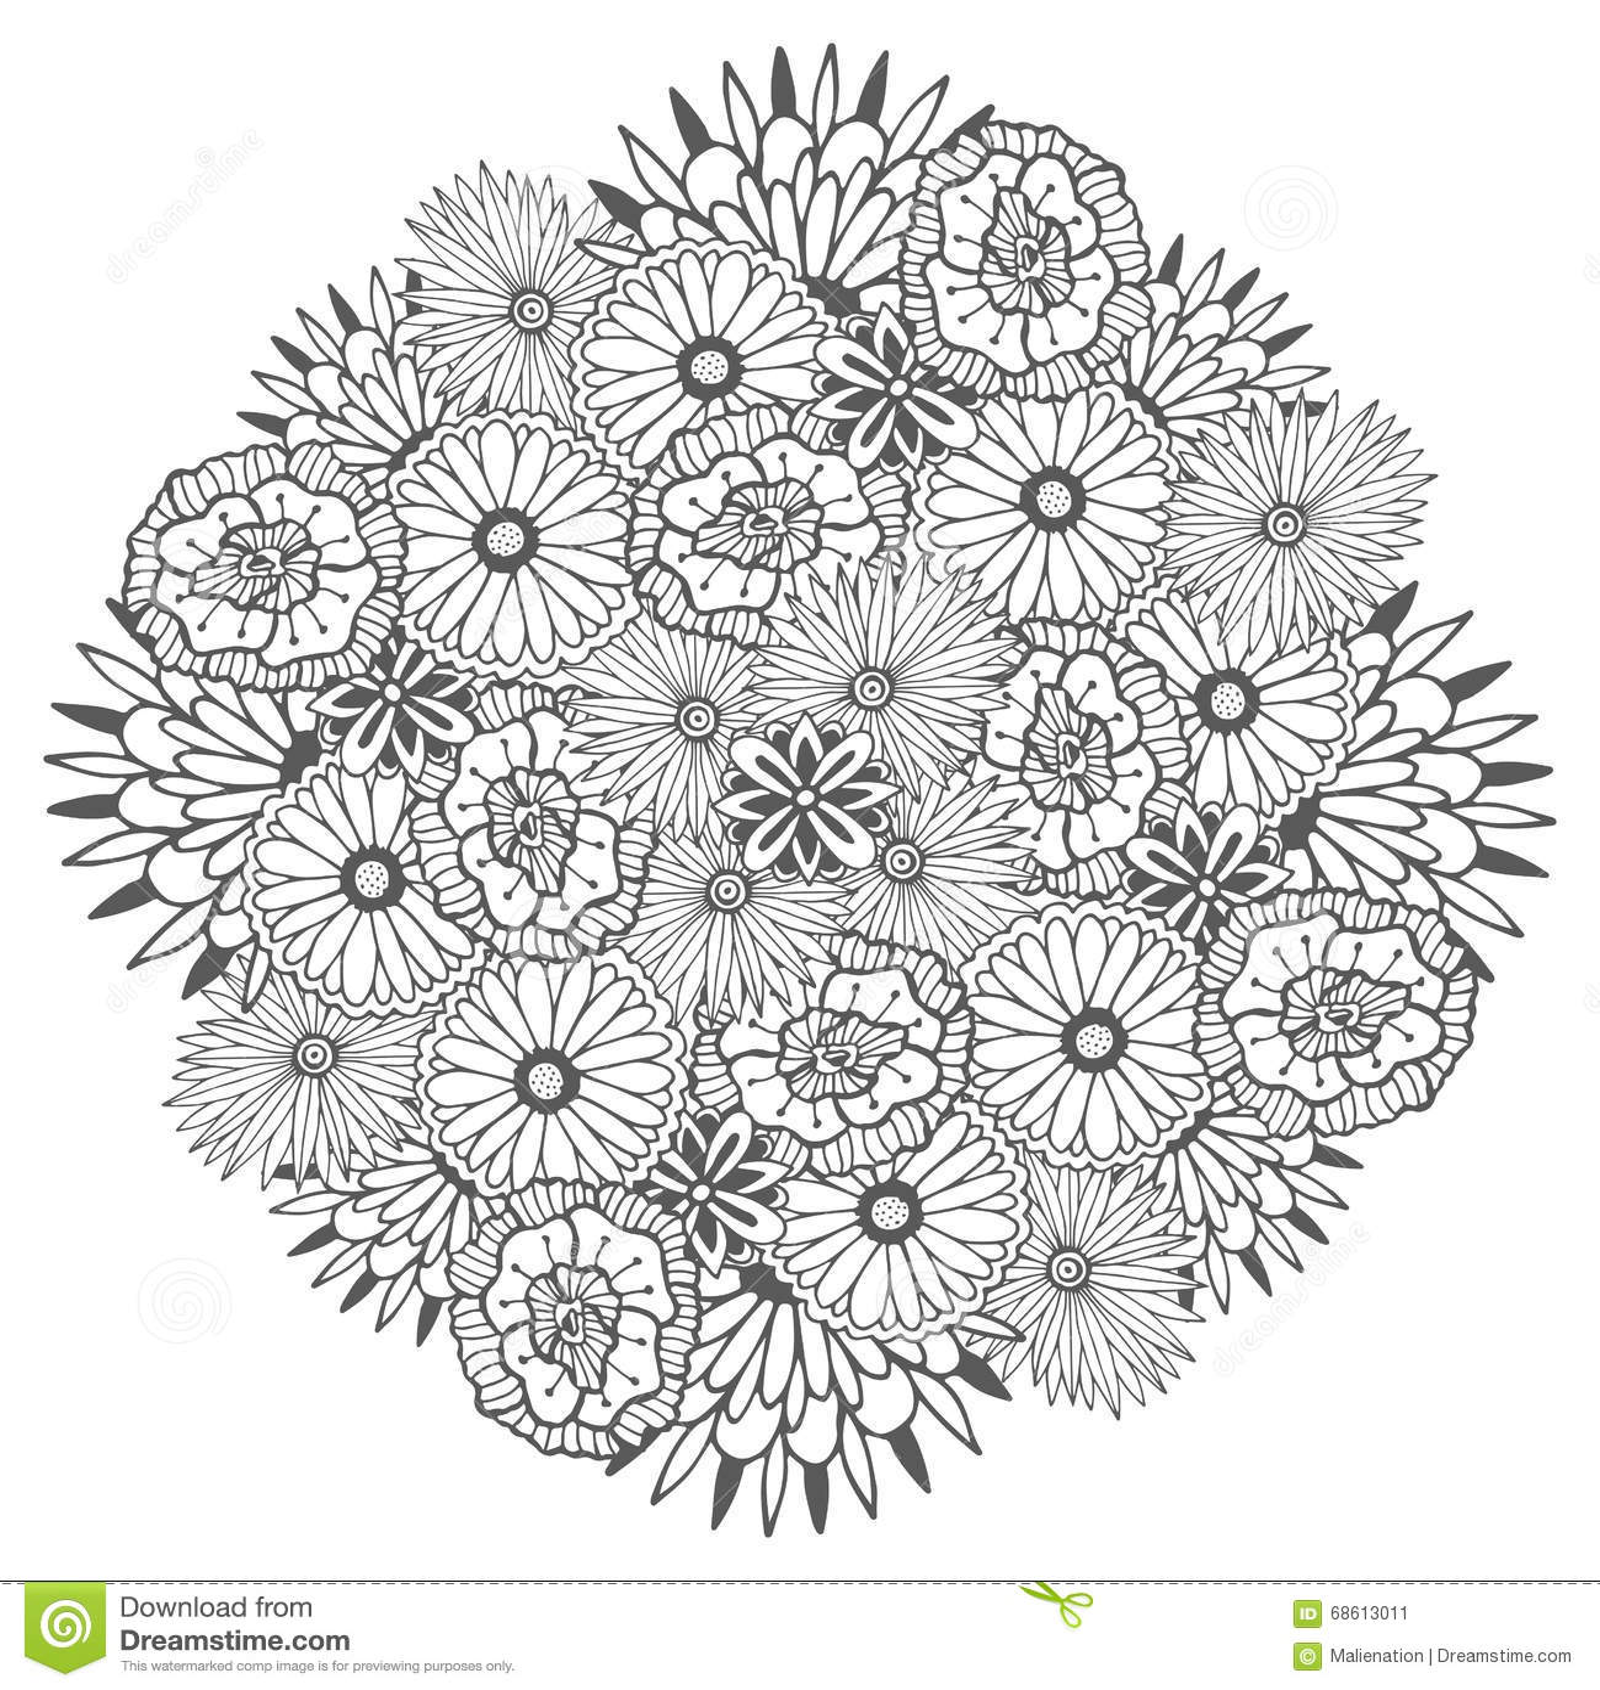 Mandala Unica Del Vector Con Las Flores Zentangle Floral Redondo